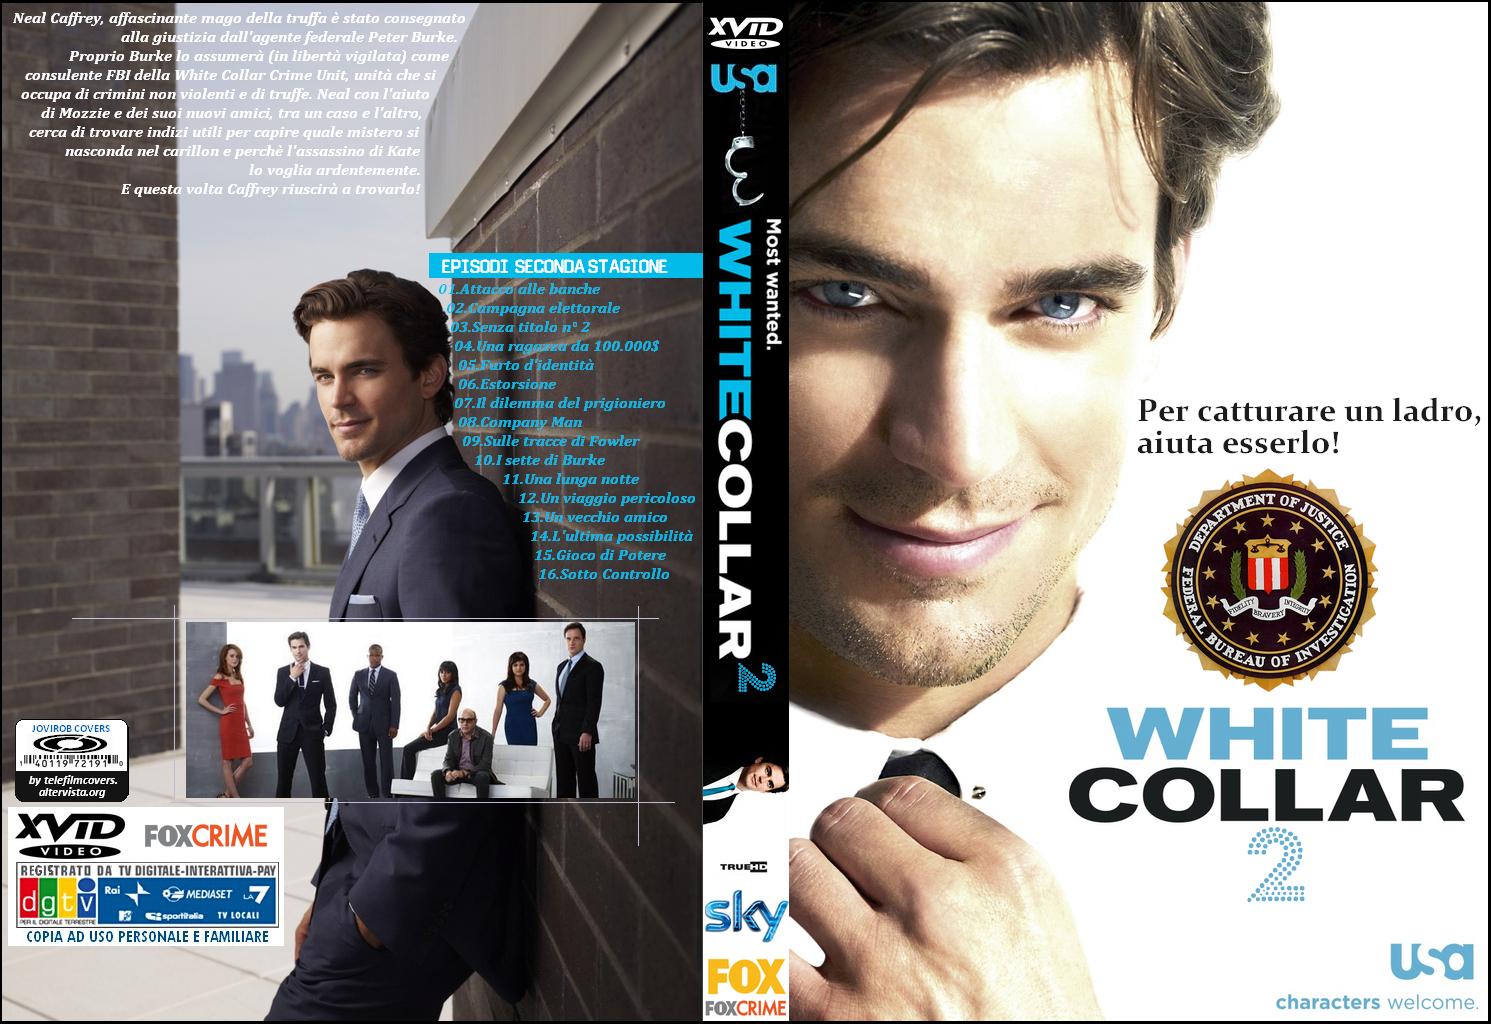 The Dilemma Dvd Cover